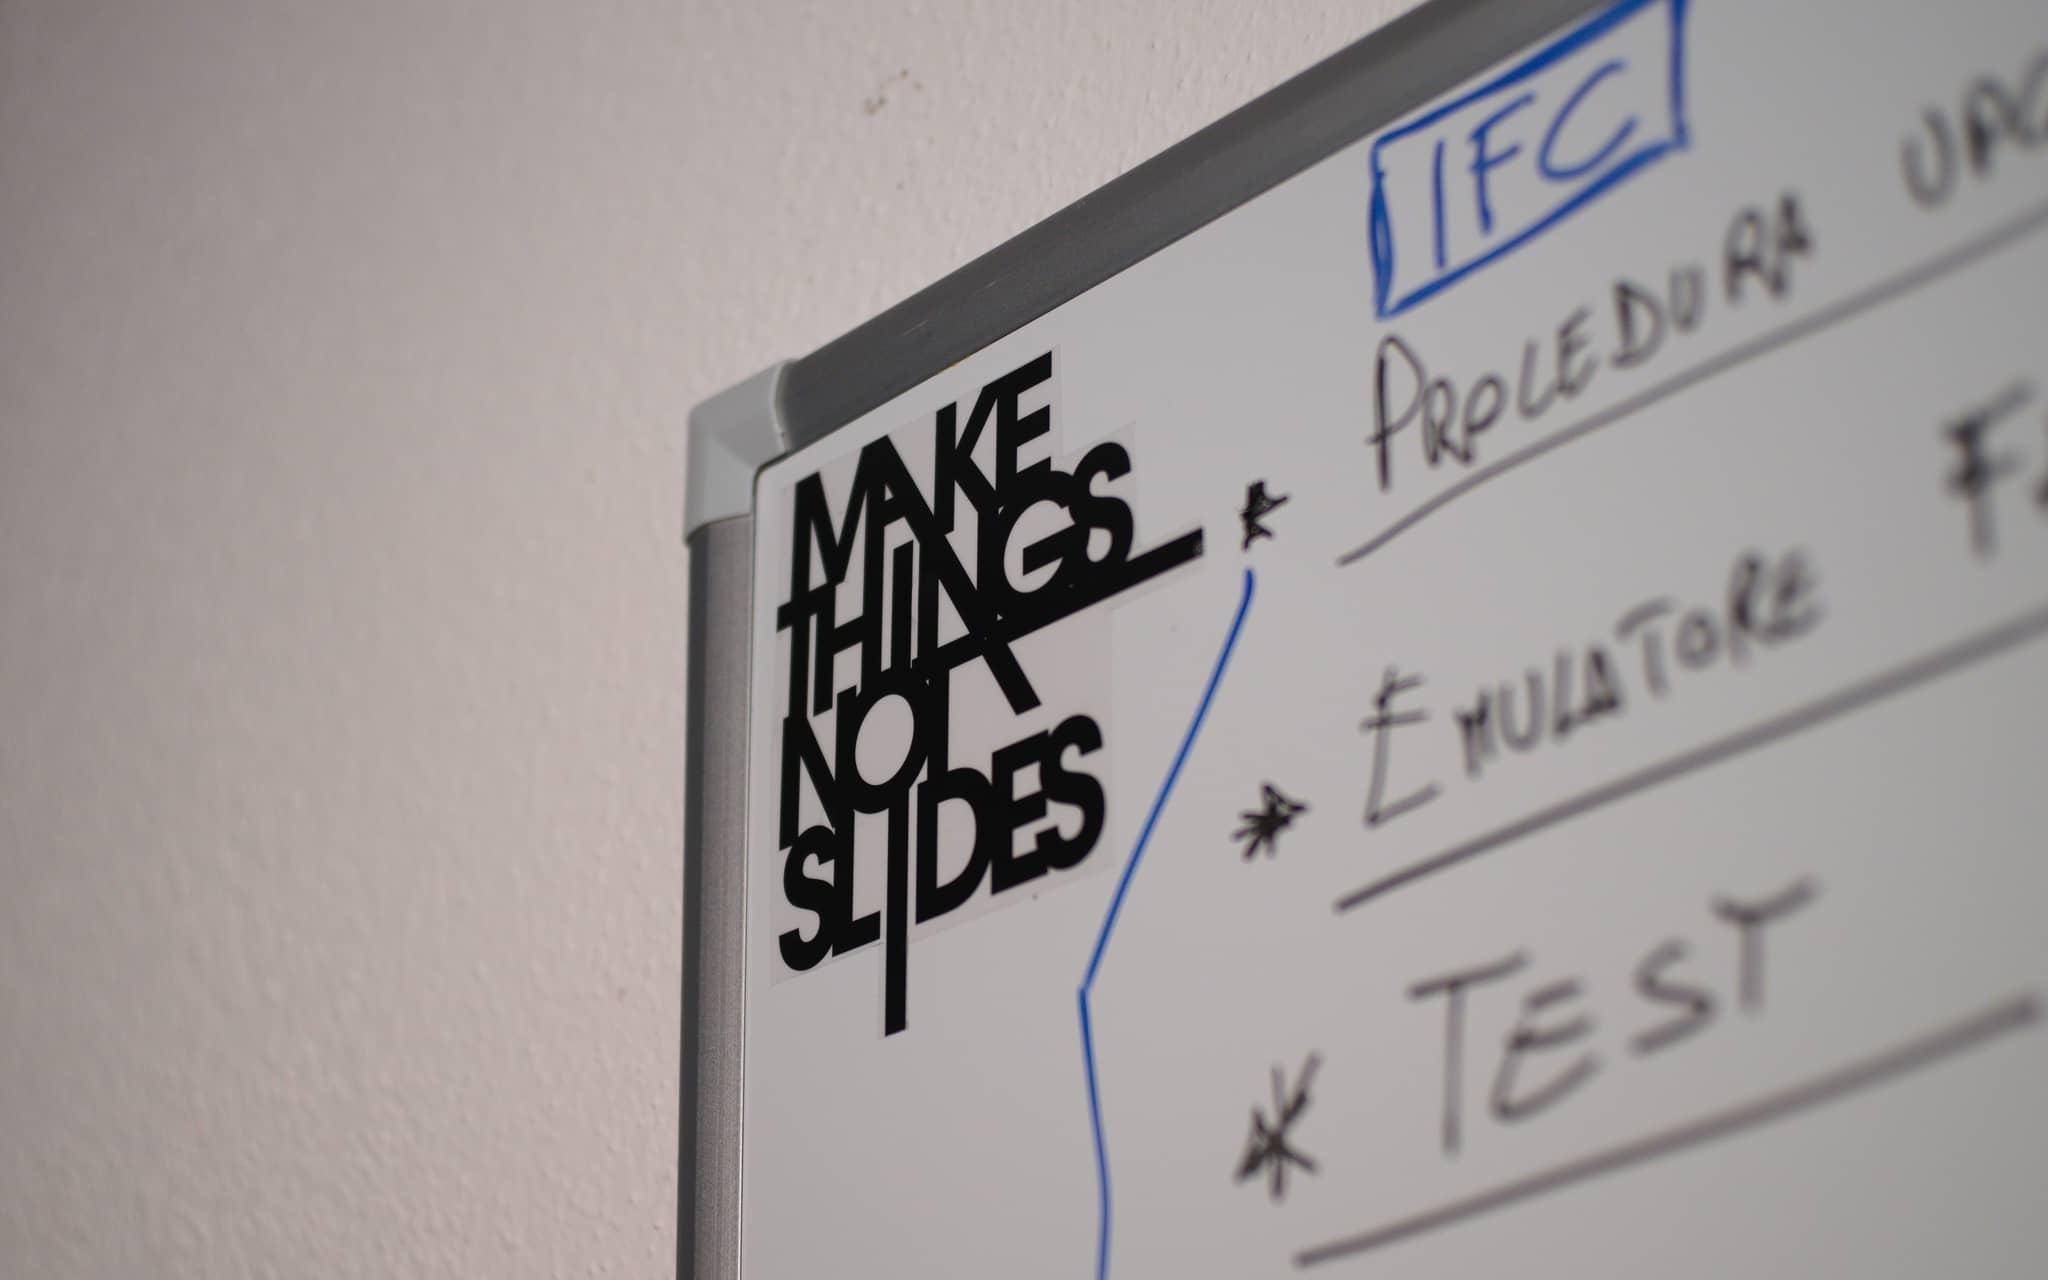 Lavagna con adesivo 'Make things, not slides'